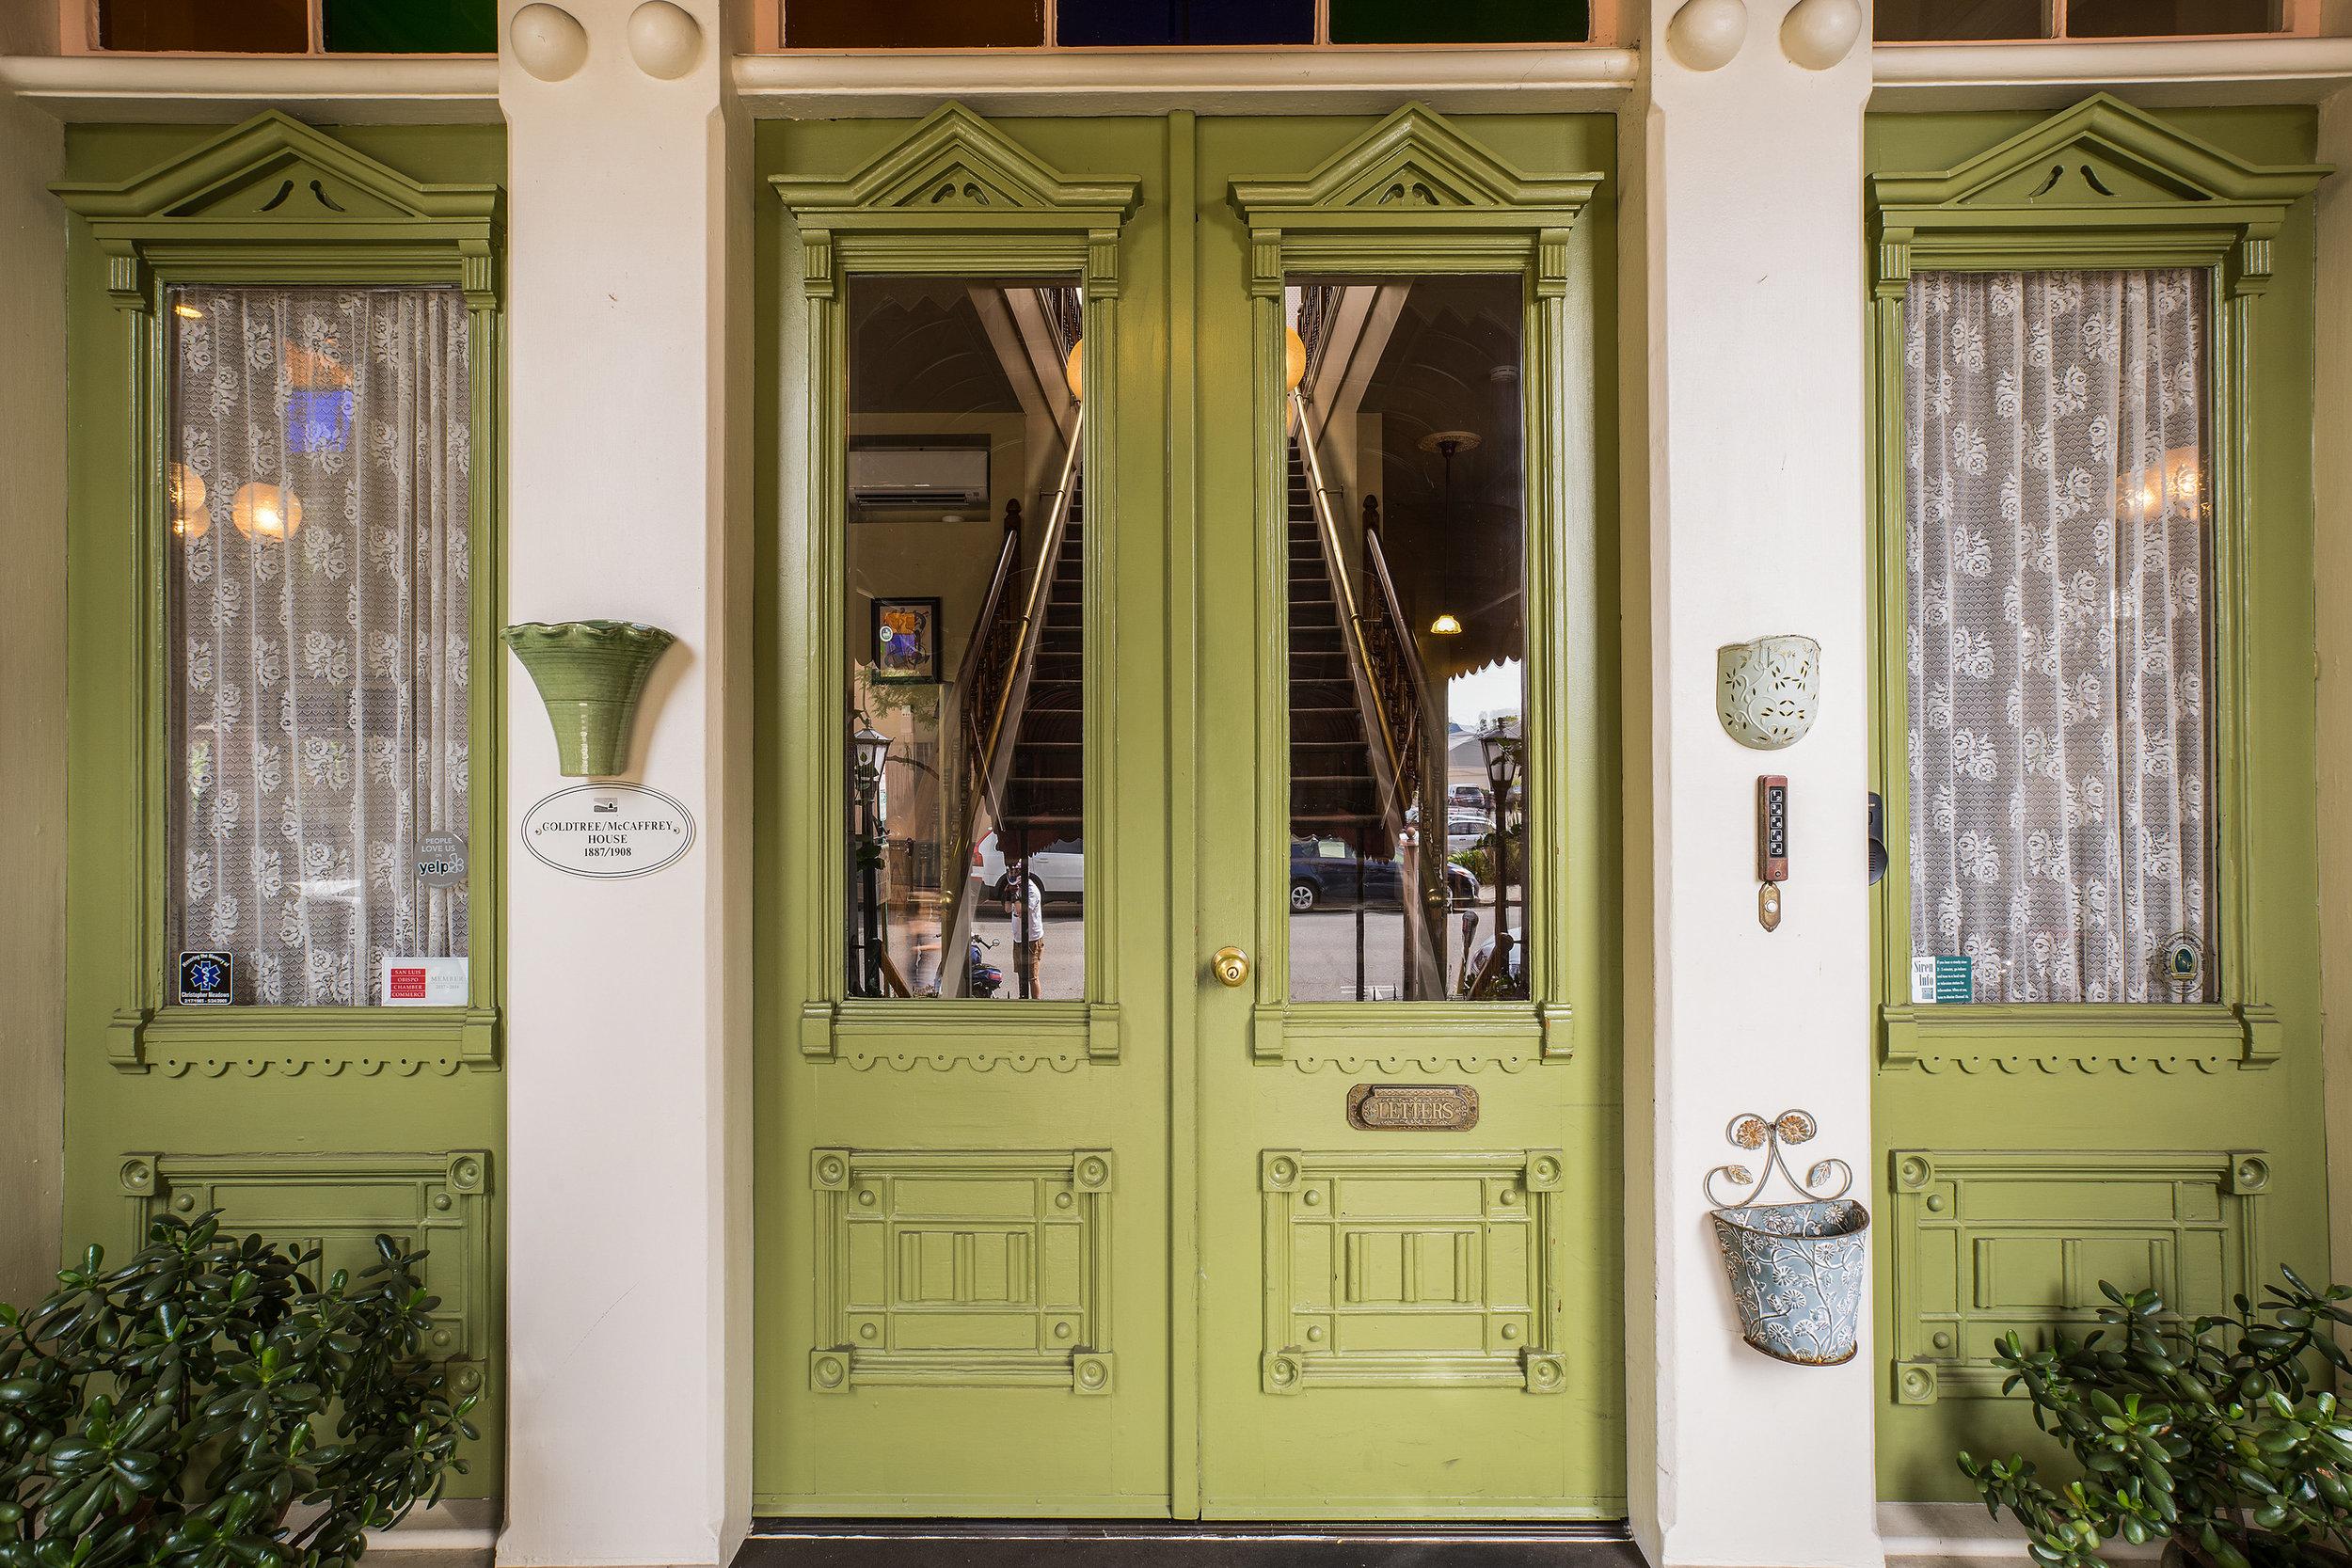 Garden Street Inn enterance